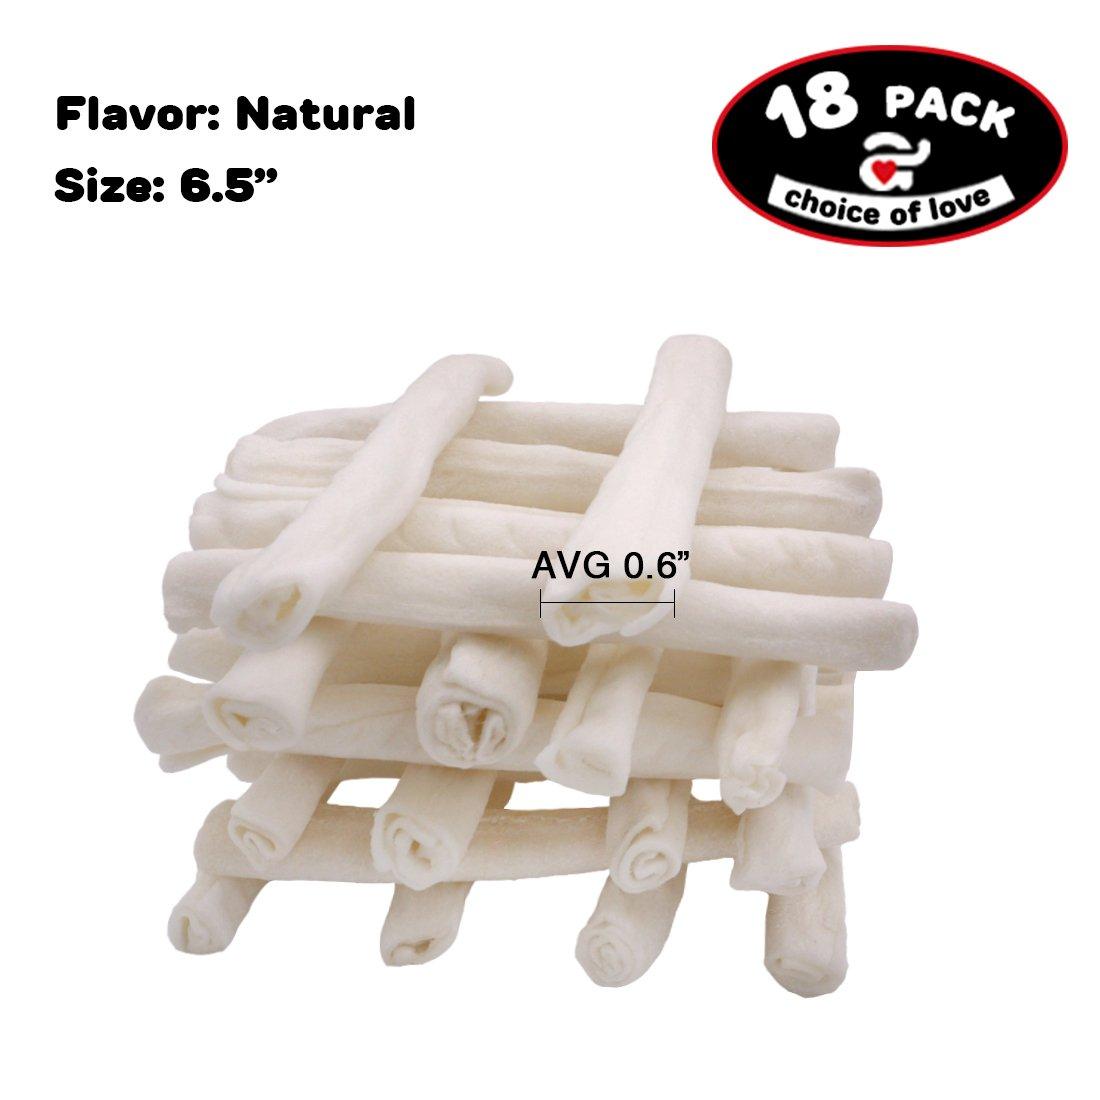 AZUZA 6.5'' Retriever Rolls 18 Count Natural Rawhide Chews for Dog Treats (6.5inch)